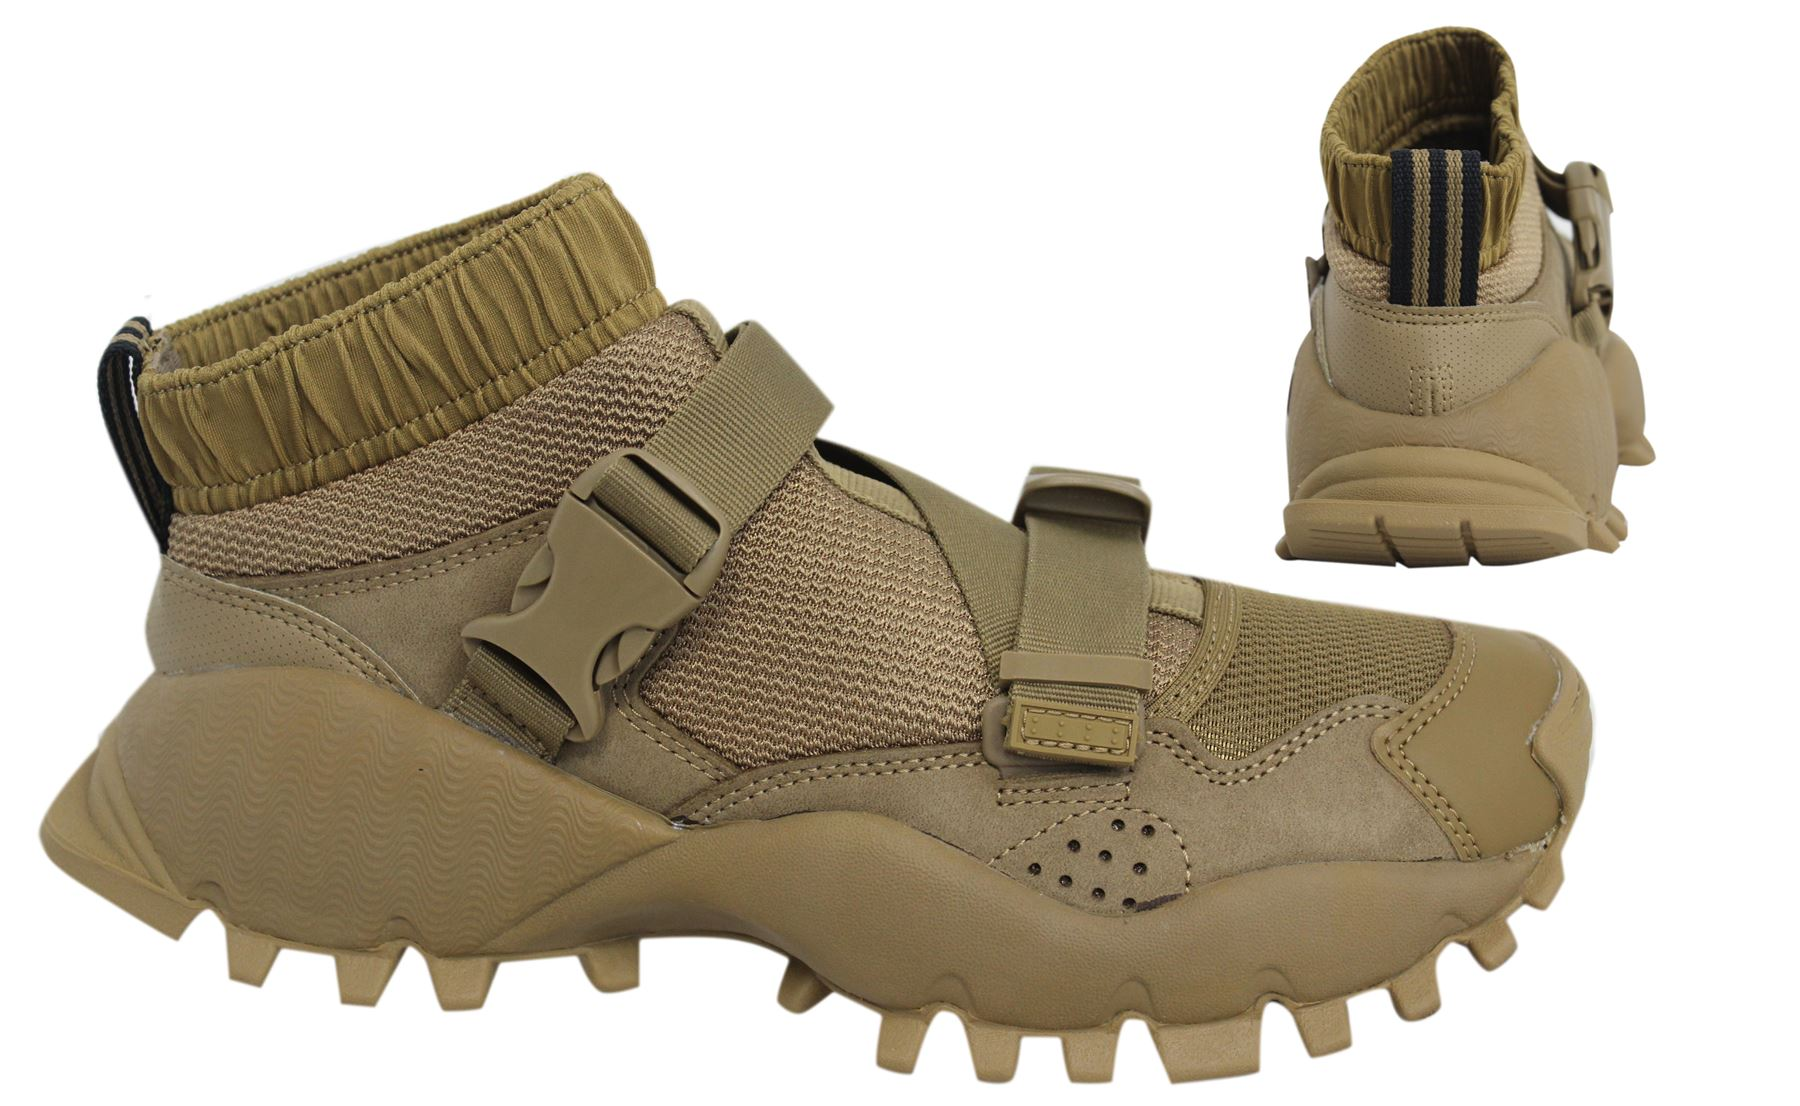 Adidas Originals HYKE AOH-010 Strap Up Khaki Mens Trainers BA8359 ...